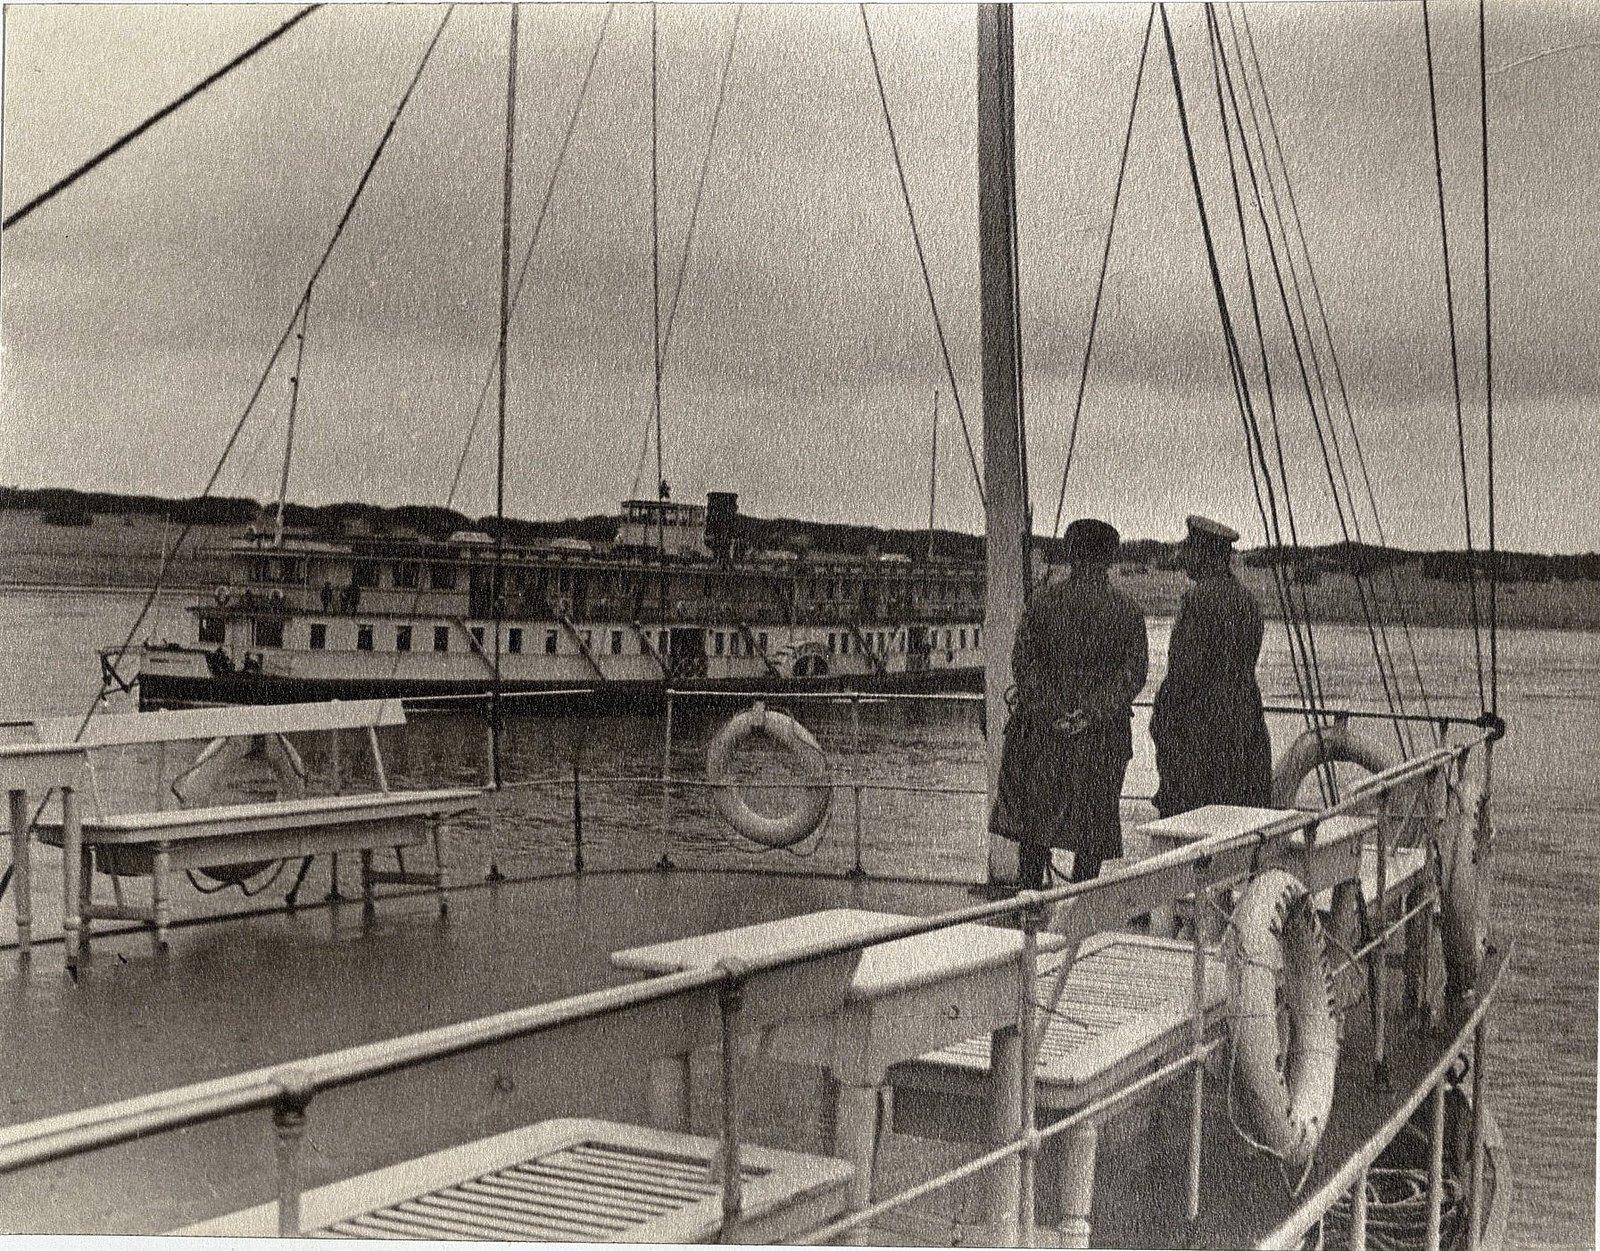 10. И.В. Сталин и К.Е. Ворошилов на теплоходе Клара Цеткин. Август 1933